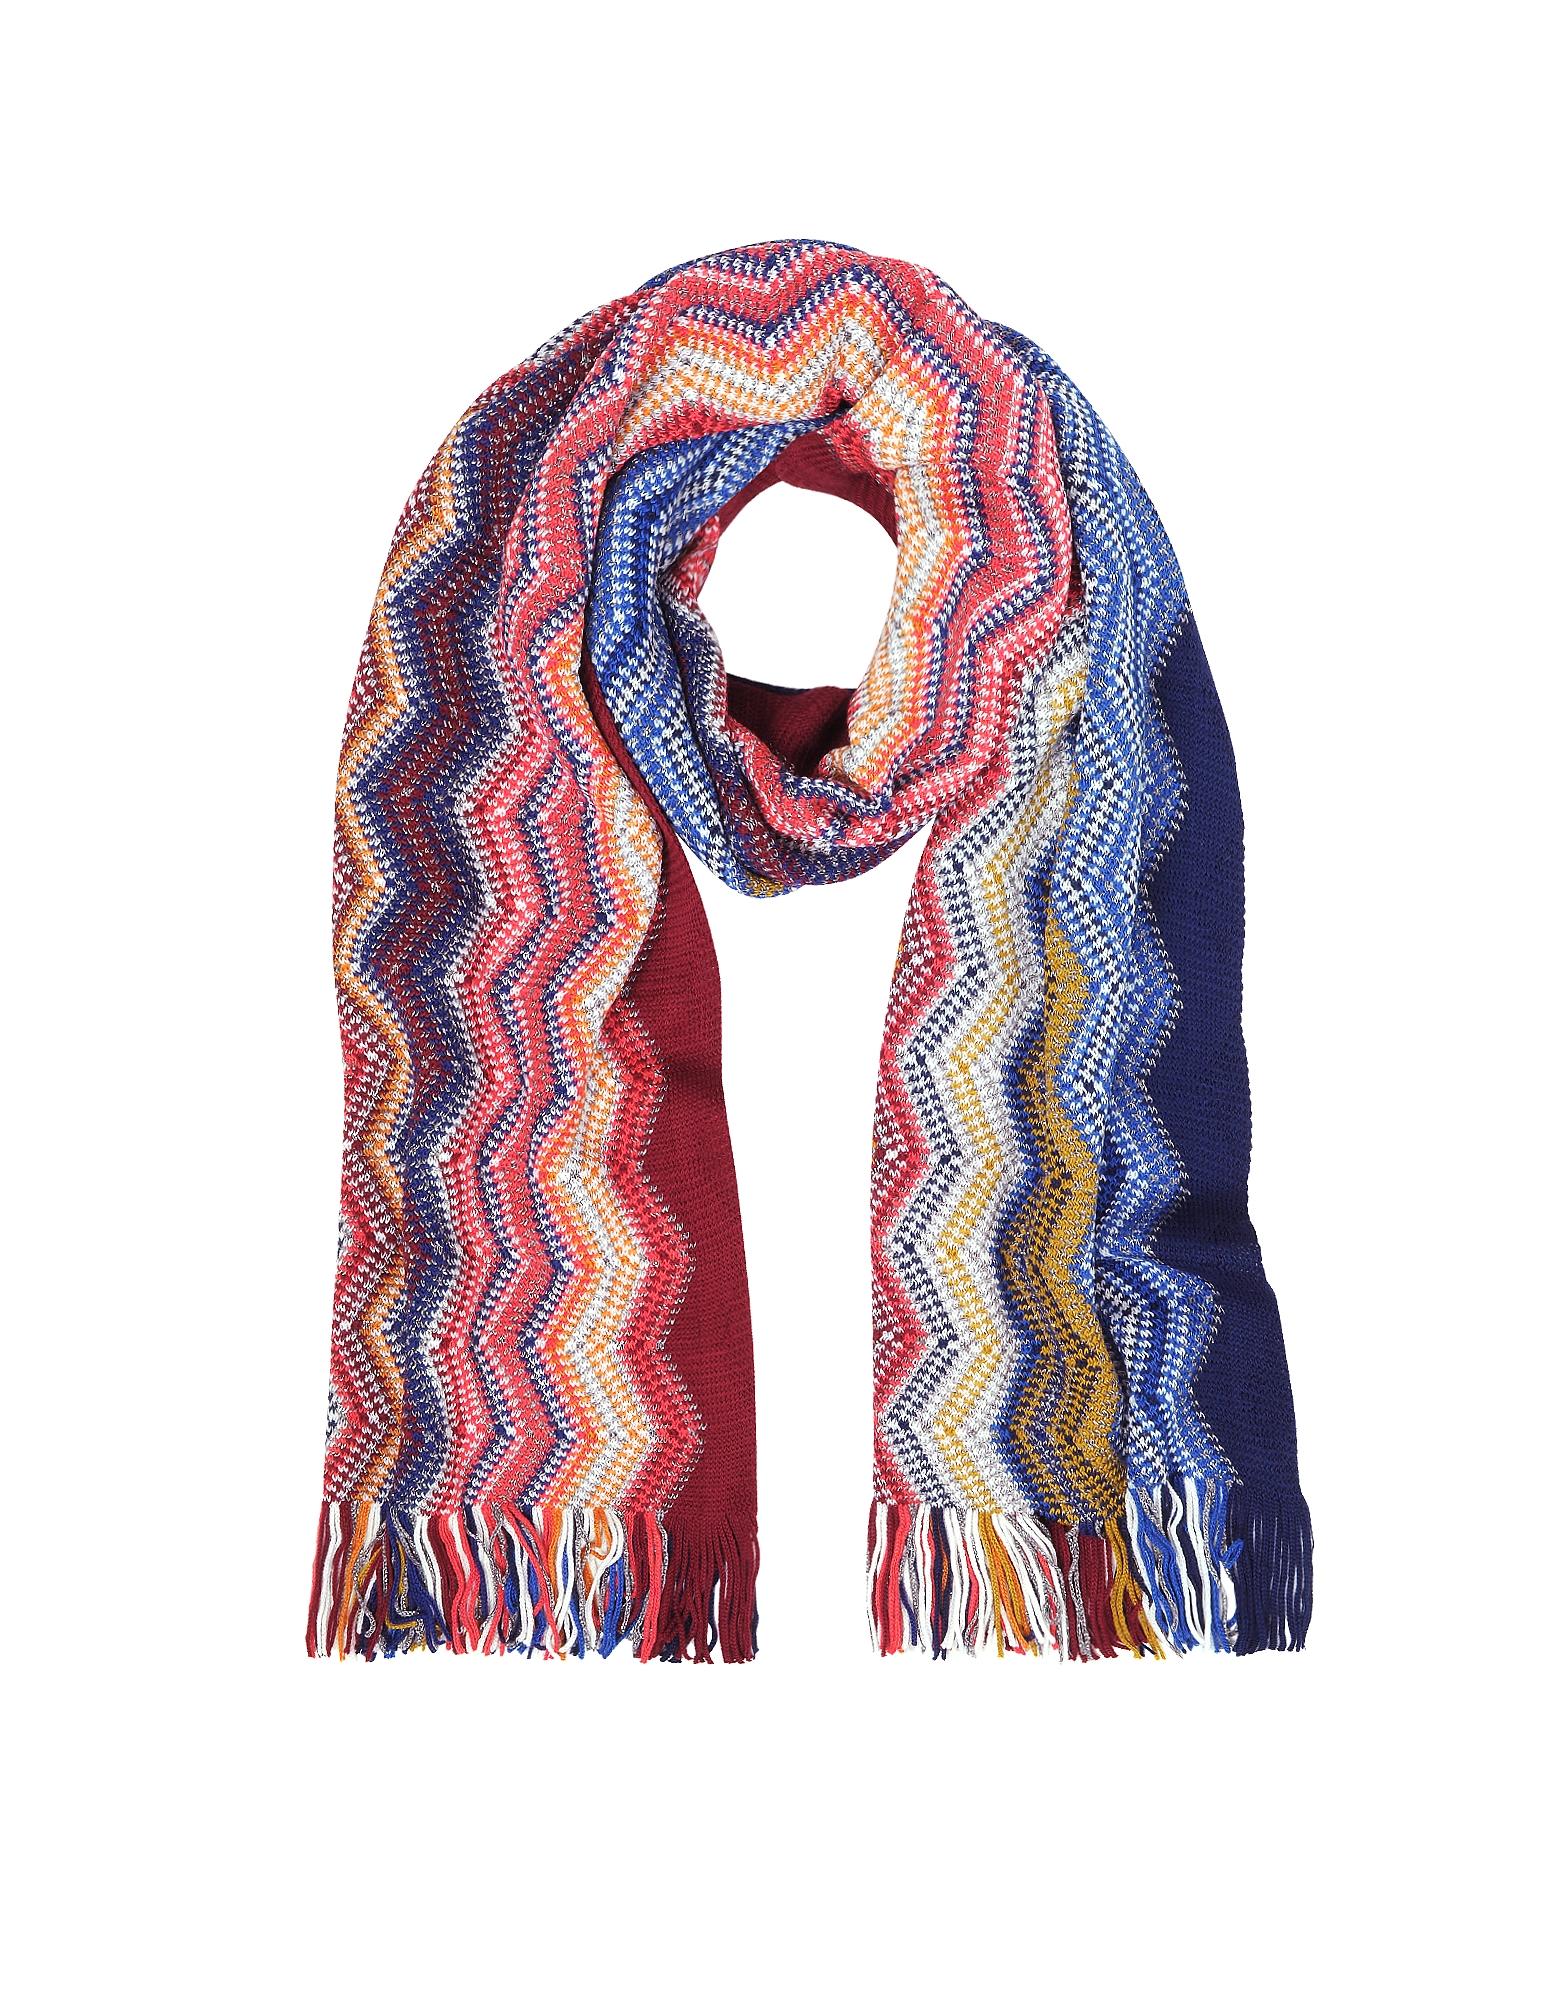 Blue/Multicolor Large Zig Zag Acrylic and Wool Lurex Fringed Women's Long Scarf